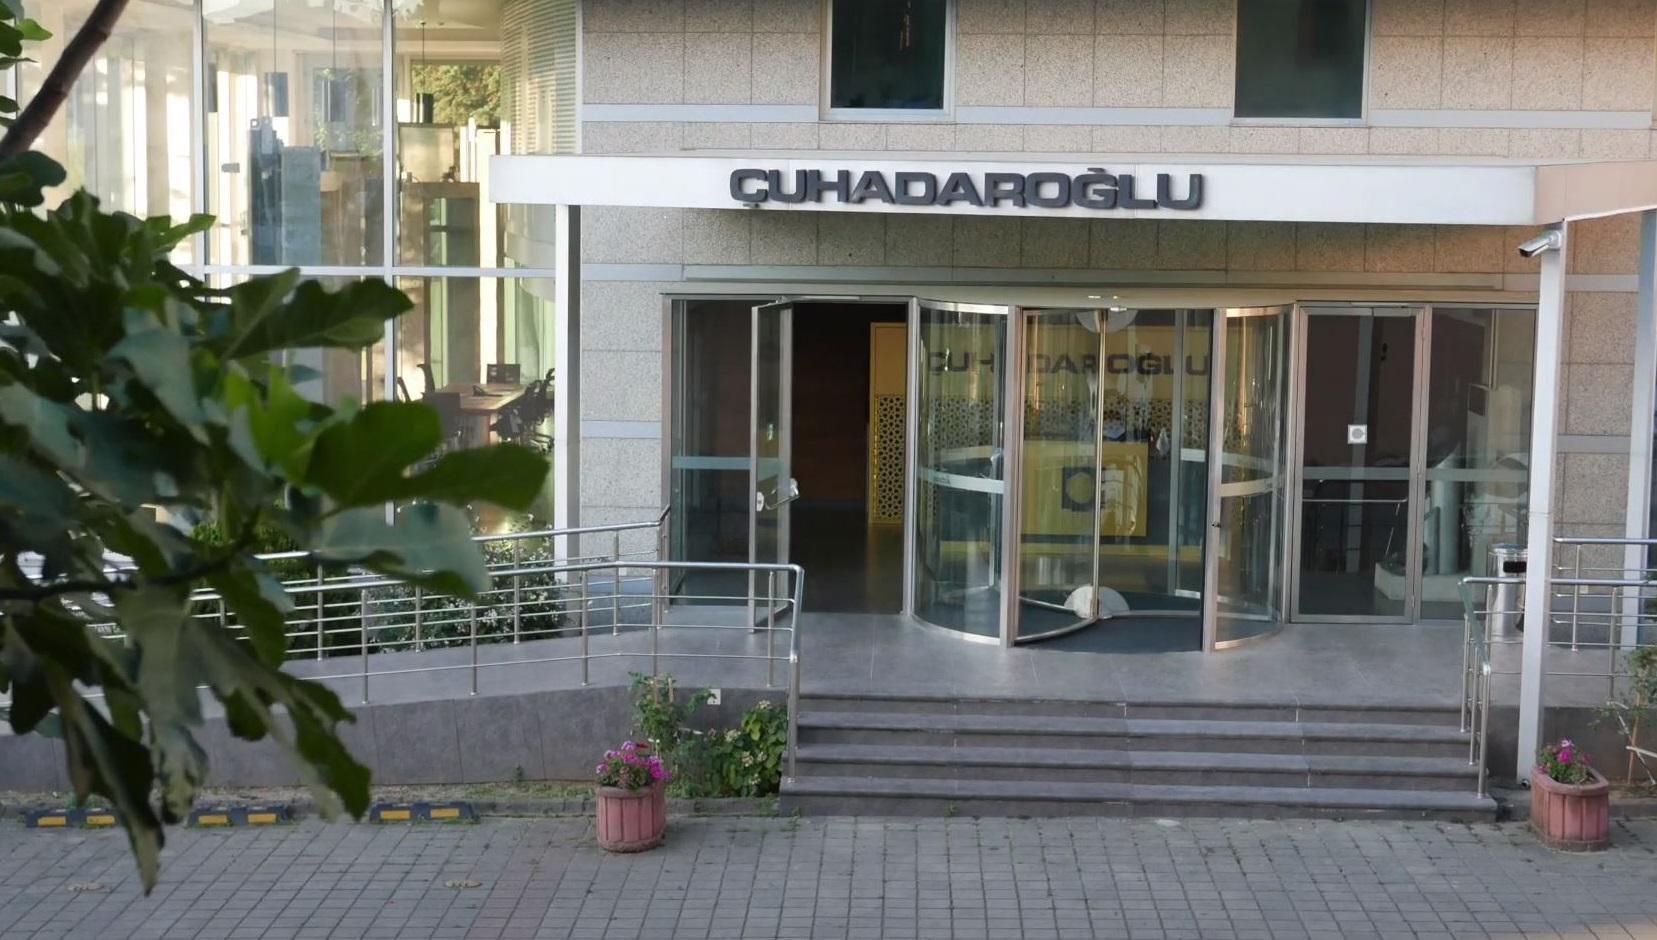 TIMELAPS VİDEO TR Cuhadaroğlu Metal Fabrika Videosu